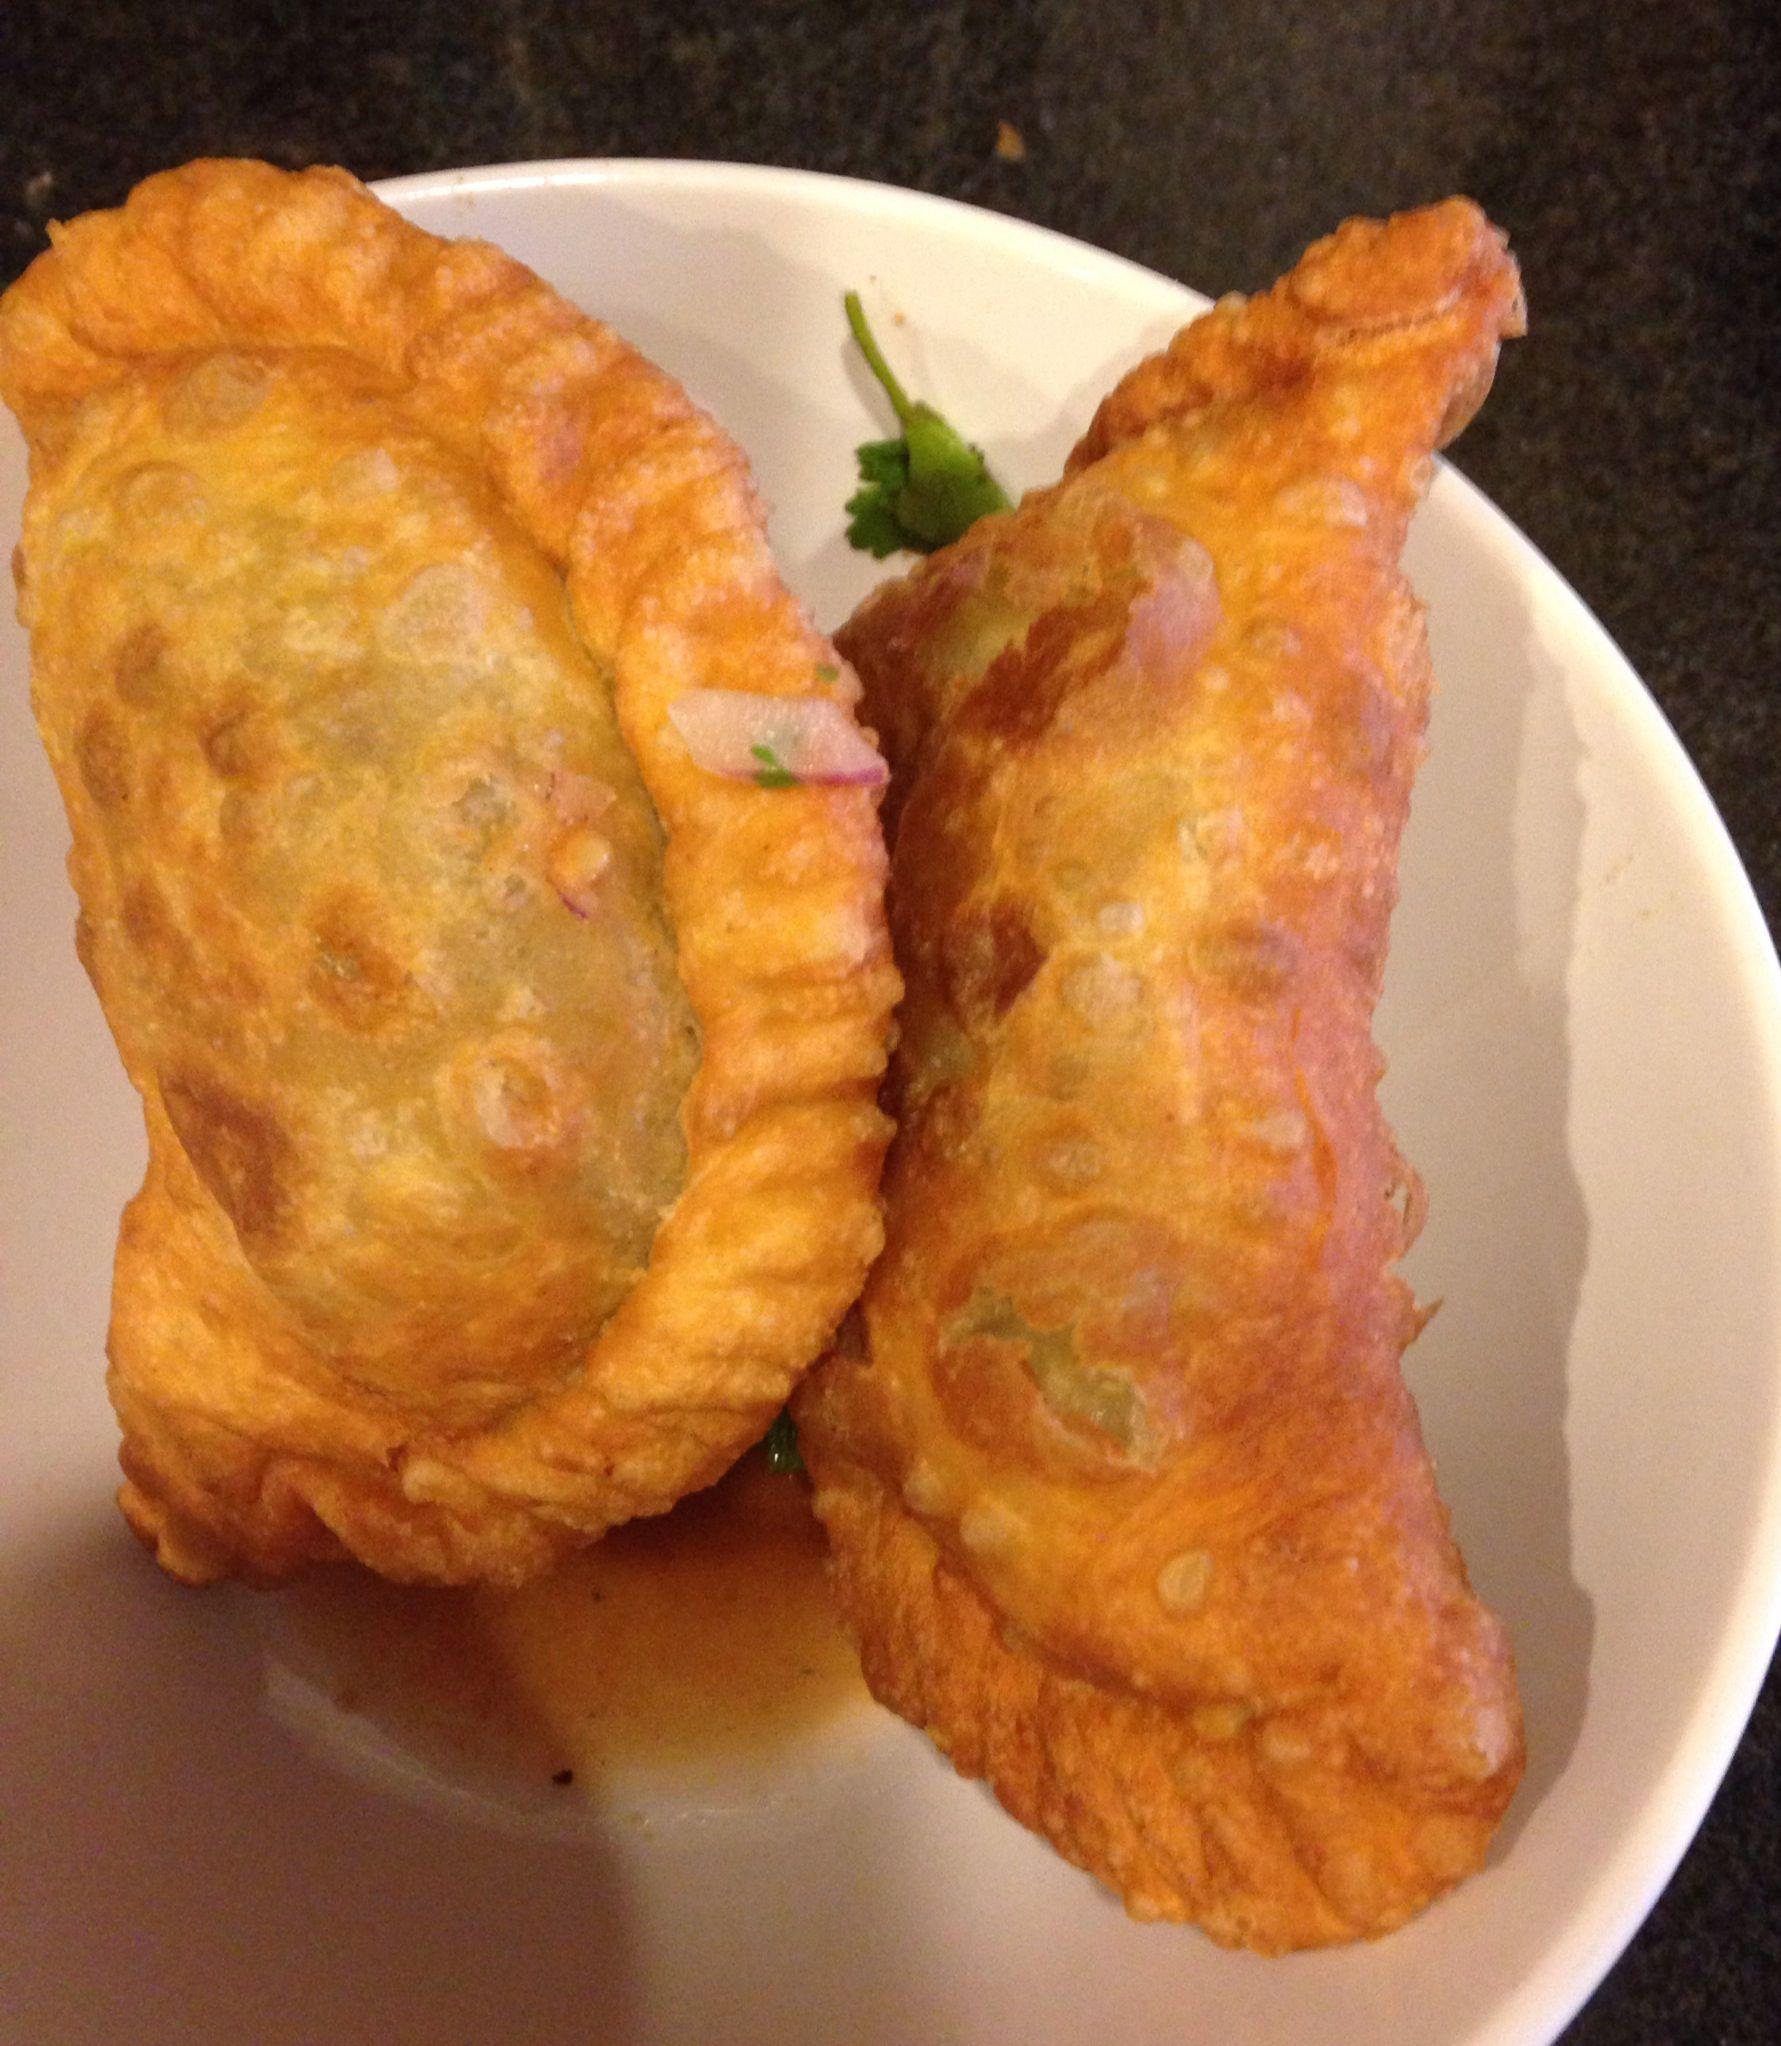 Pastelitos hondurenos | Island food, Honduran recipes, Food